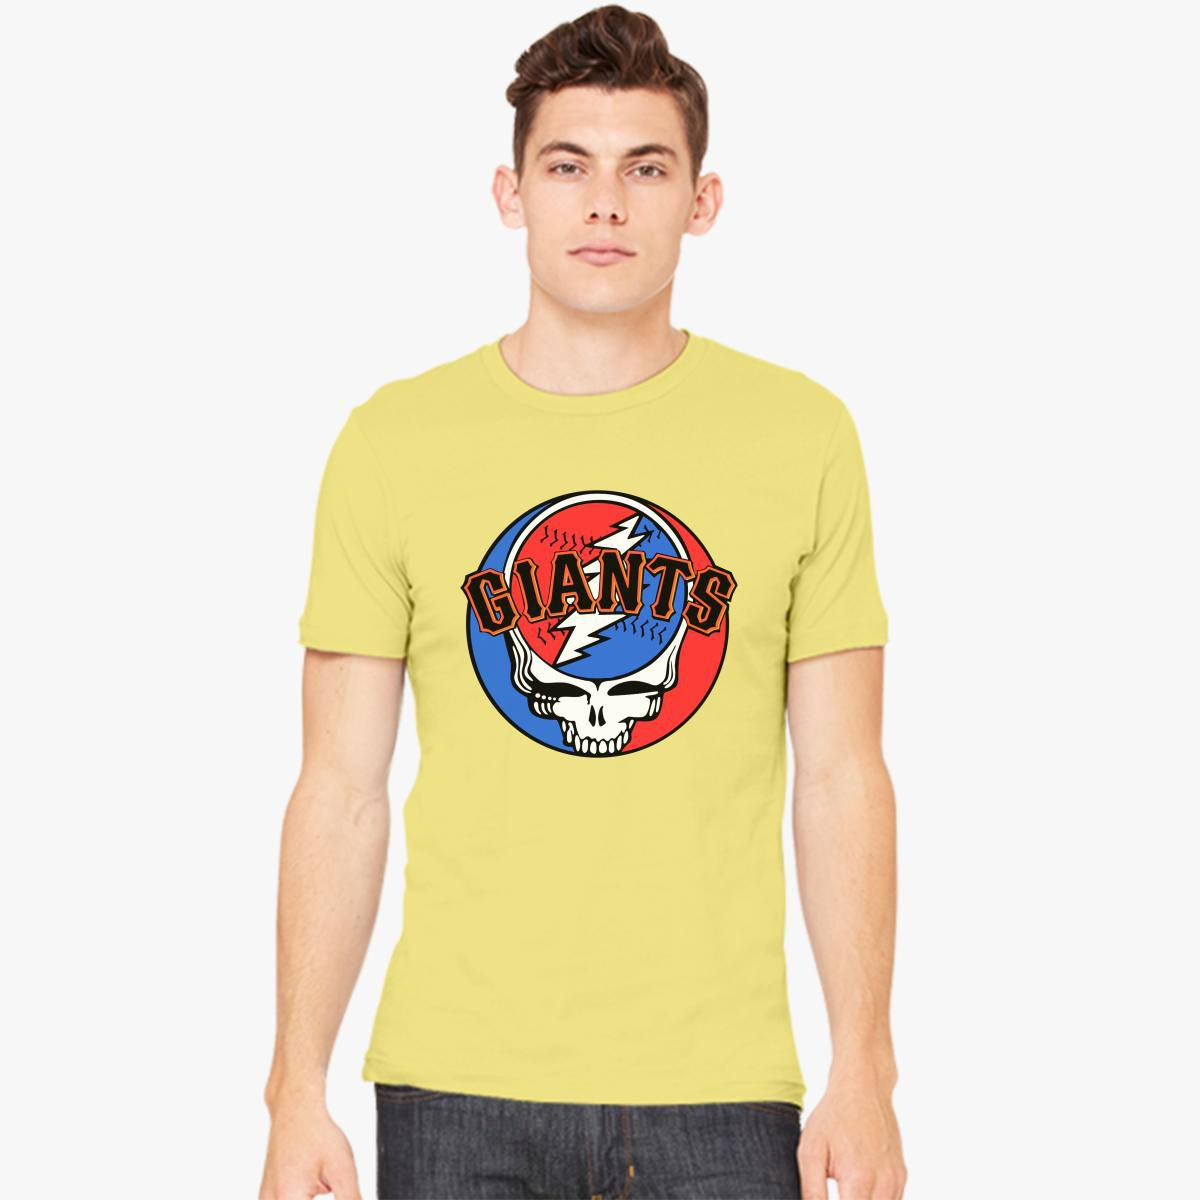 Grateful Dead Trucker Hat: Grateful Dead SF Giants Men's T-shirt